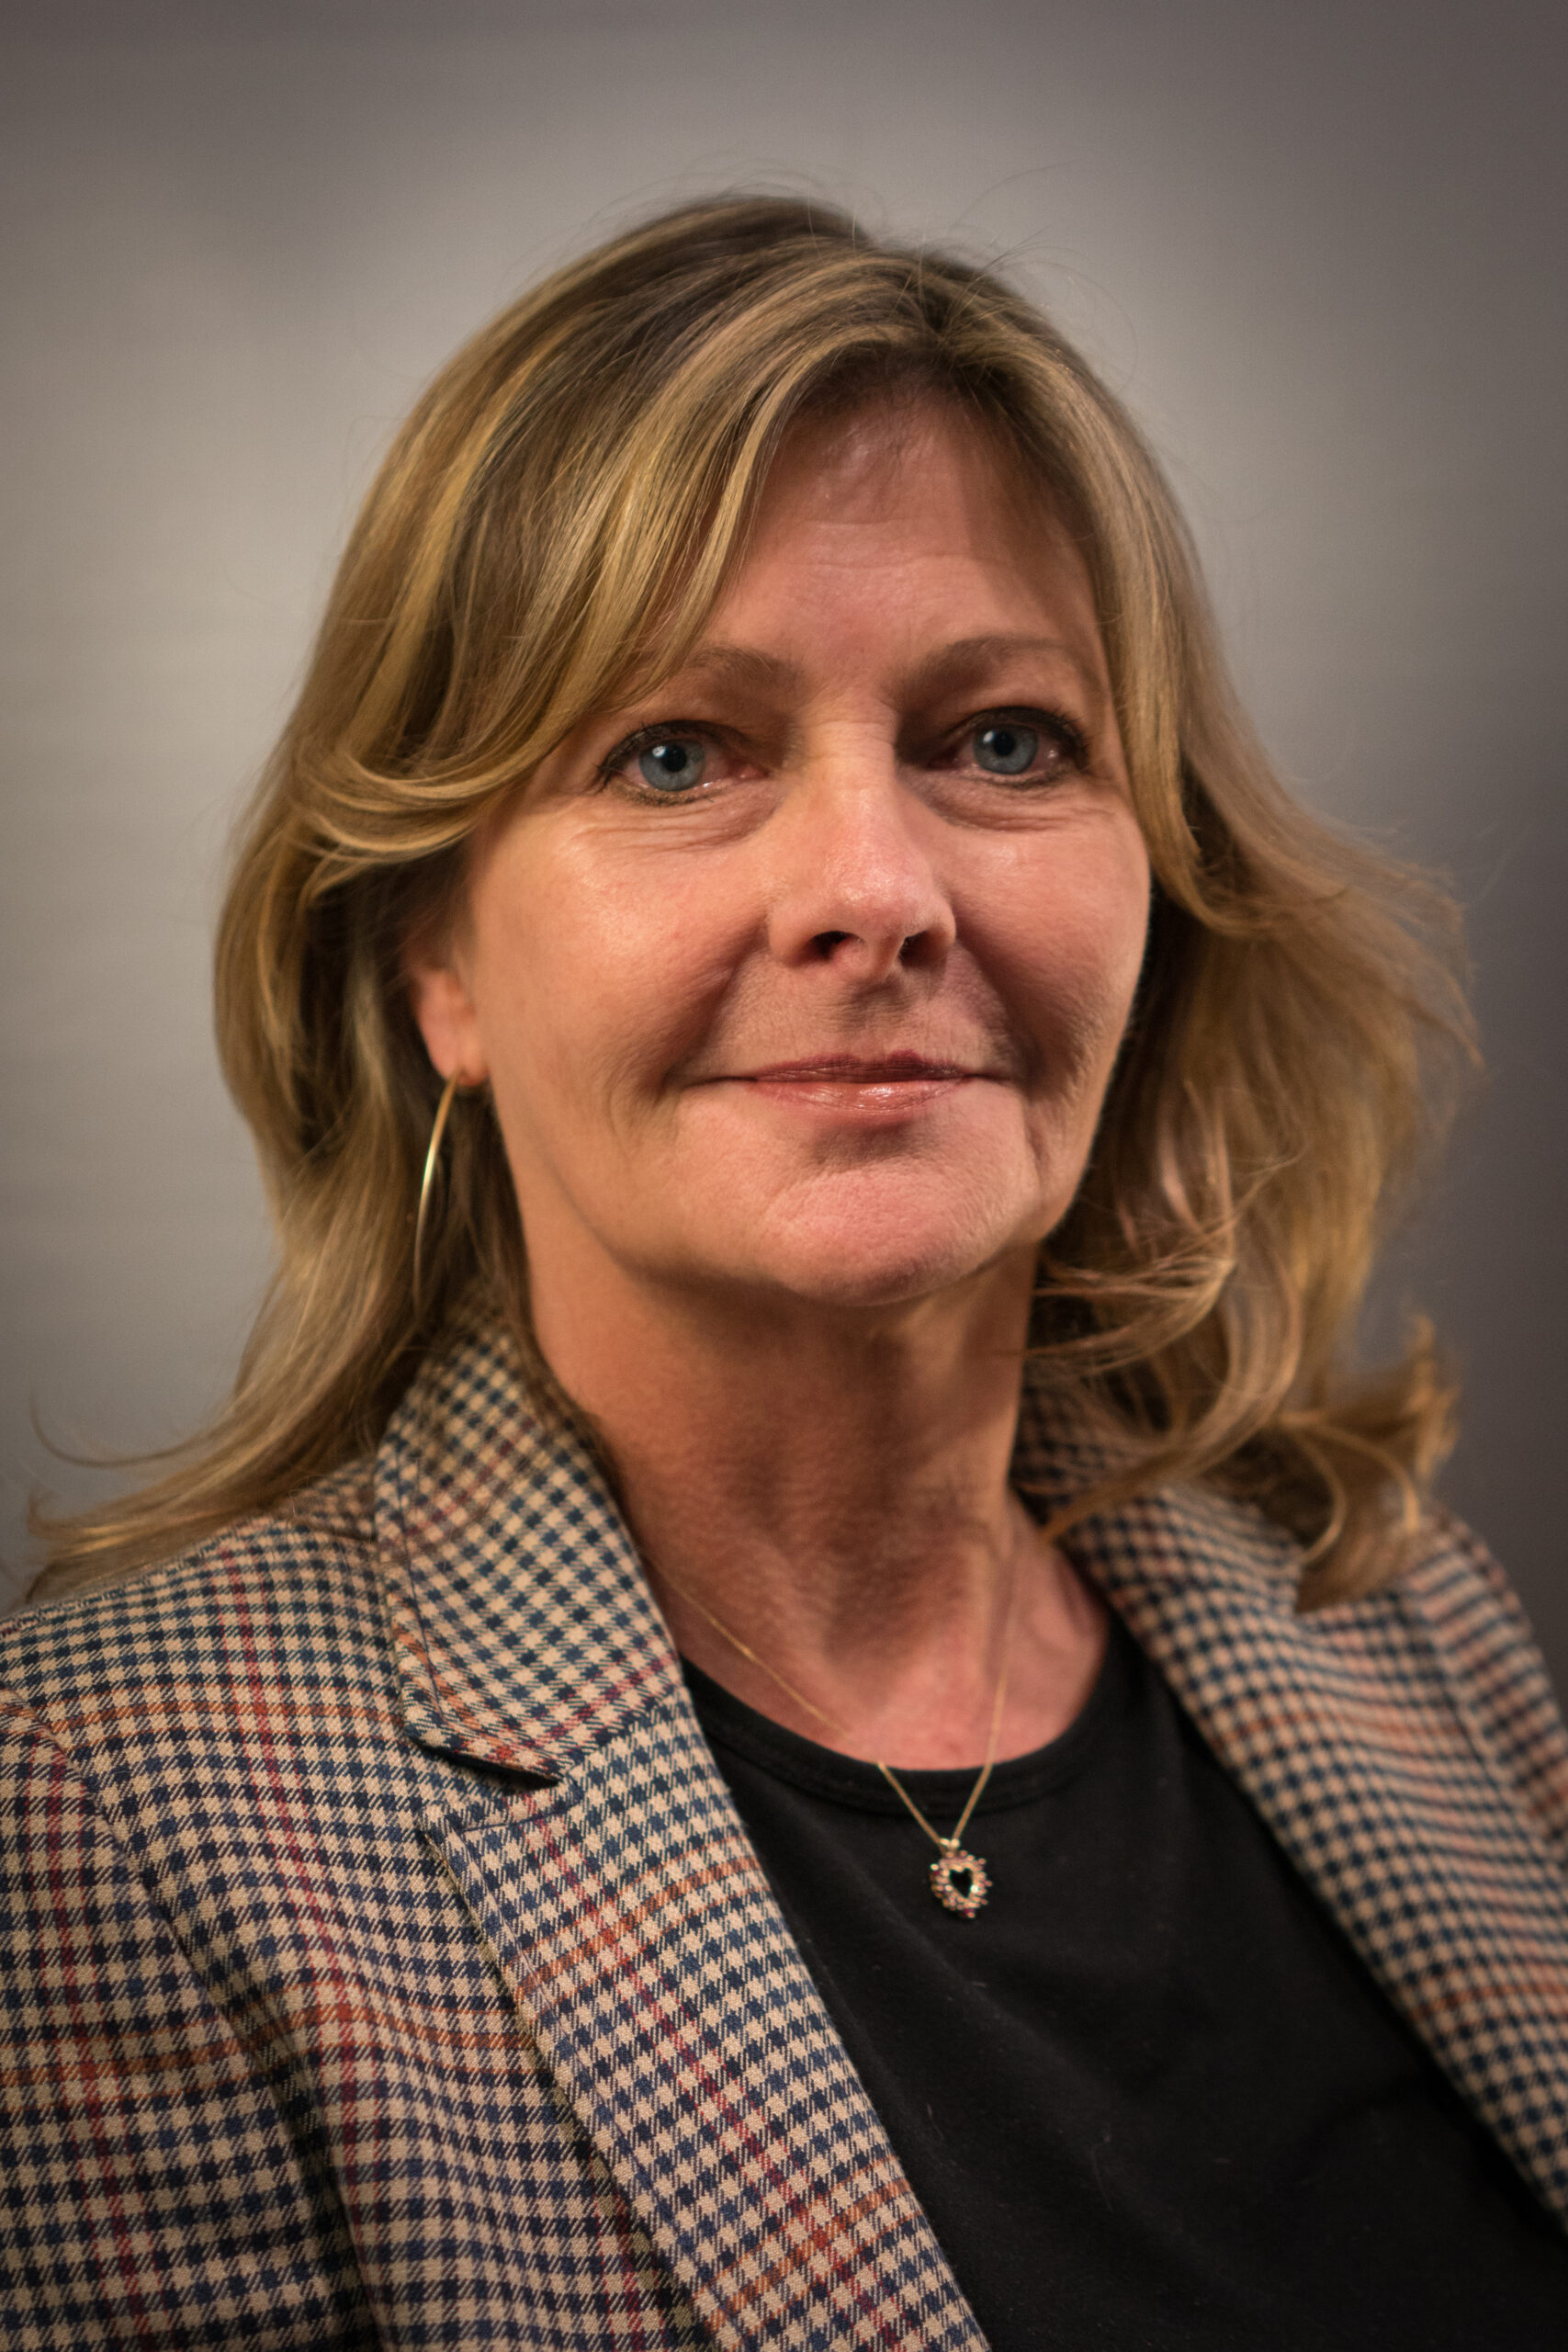 Jennifer Geleta